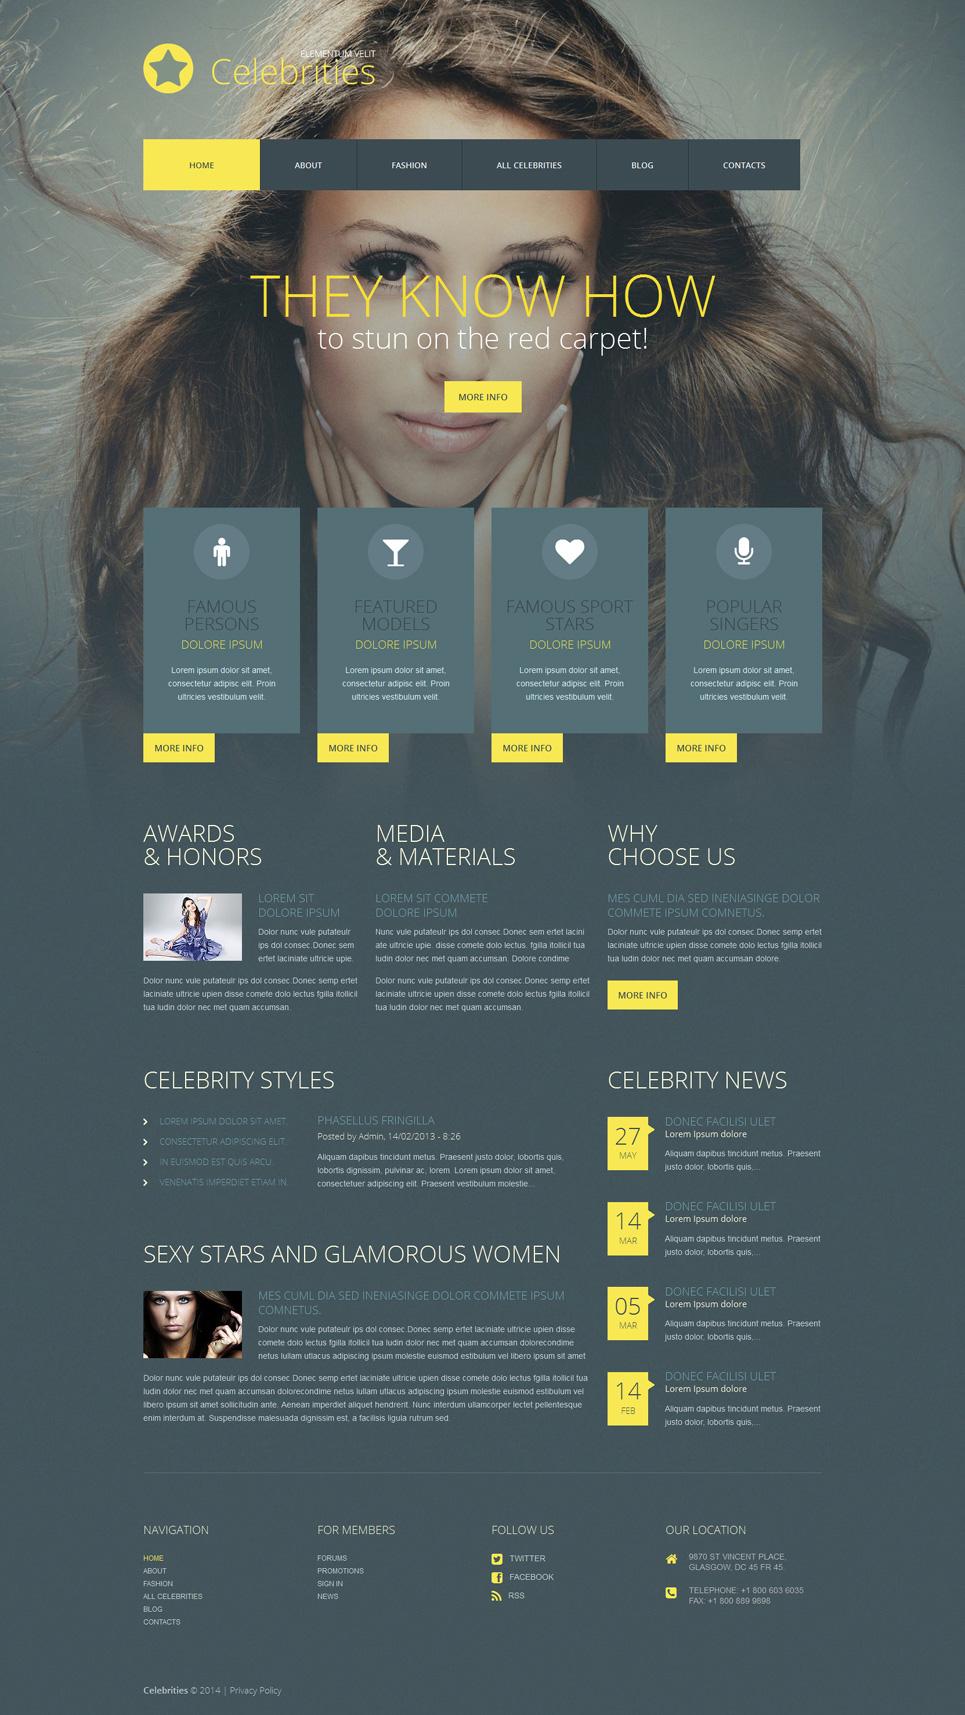 Адаптивный шаблон сайта на тему знаменитости #52063